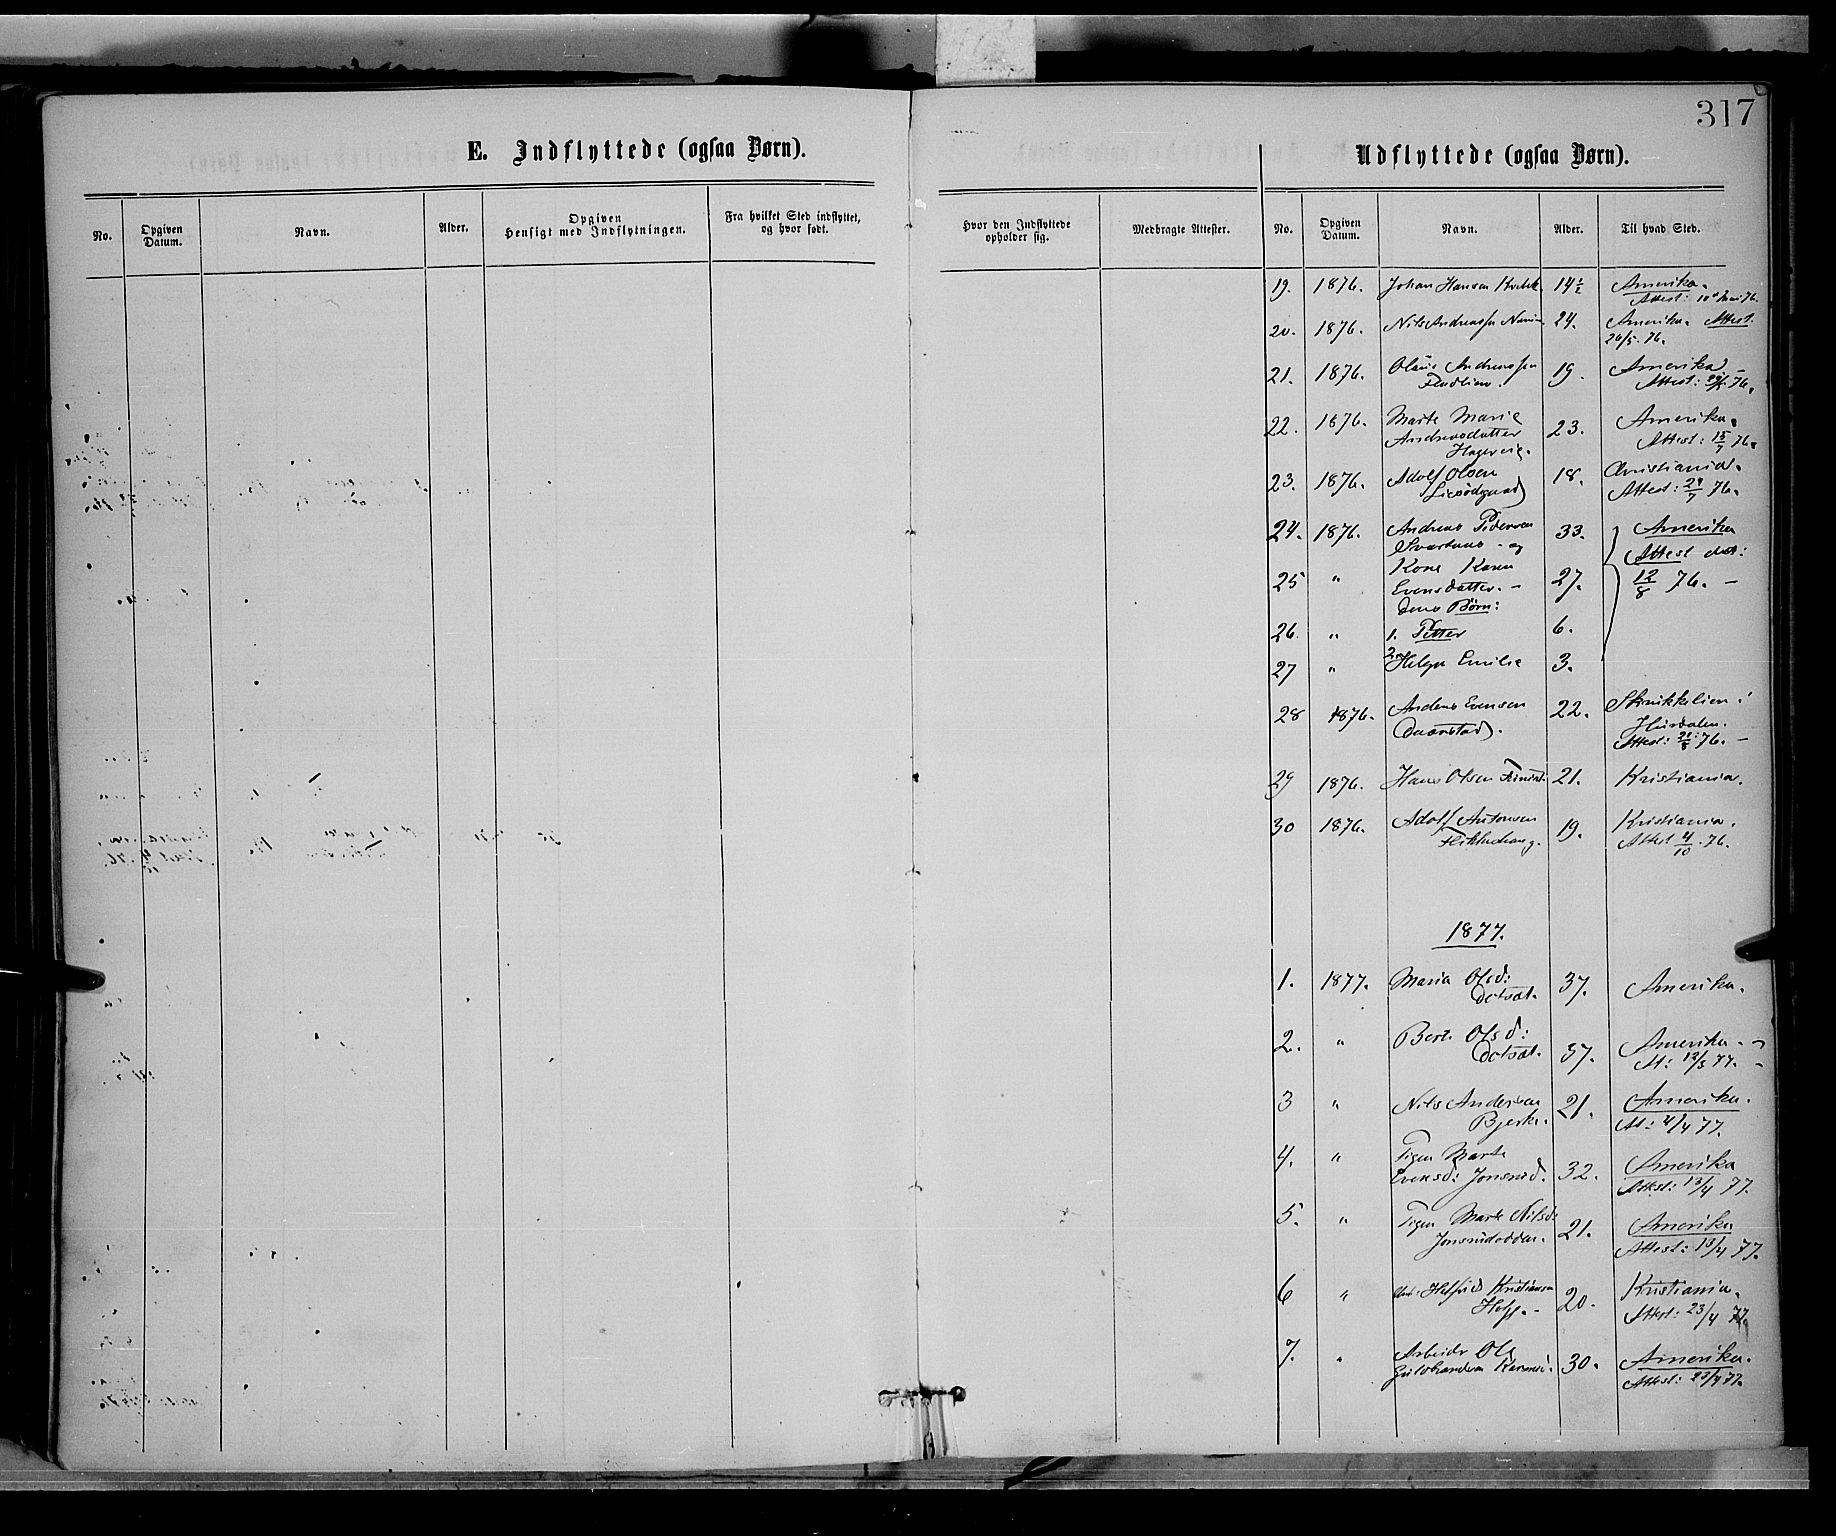 SAH, Vestre Toten prestekontor, H/Ha/Haa/L0008: Ministerialbok nr. 8, 1870-1877, s. 317